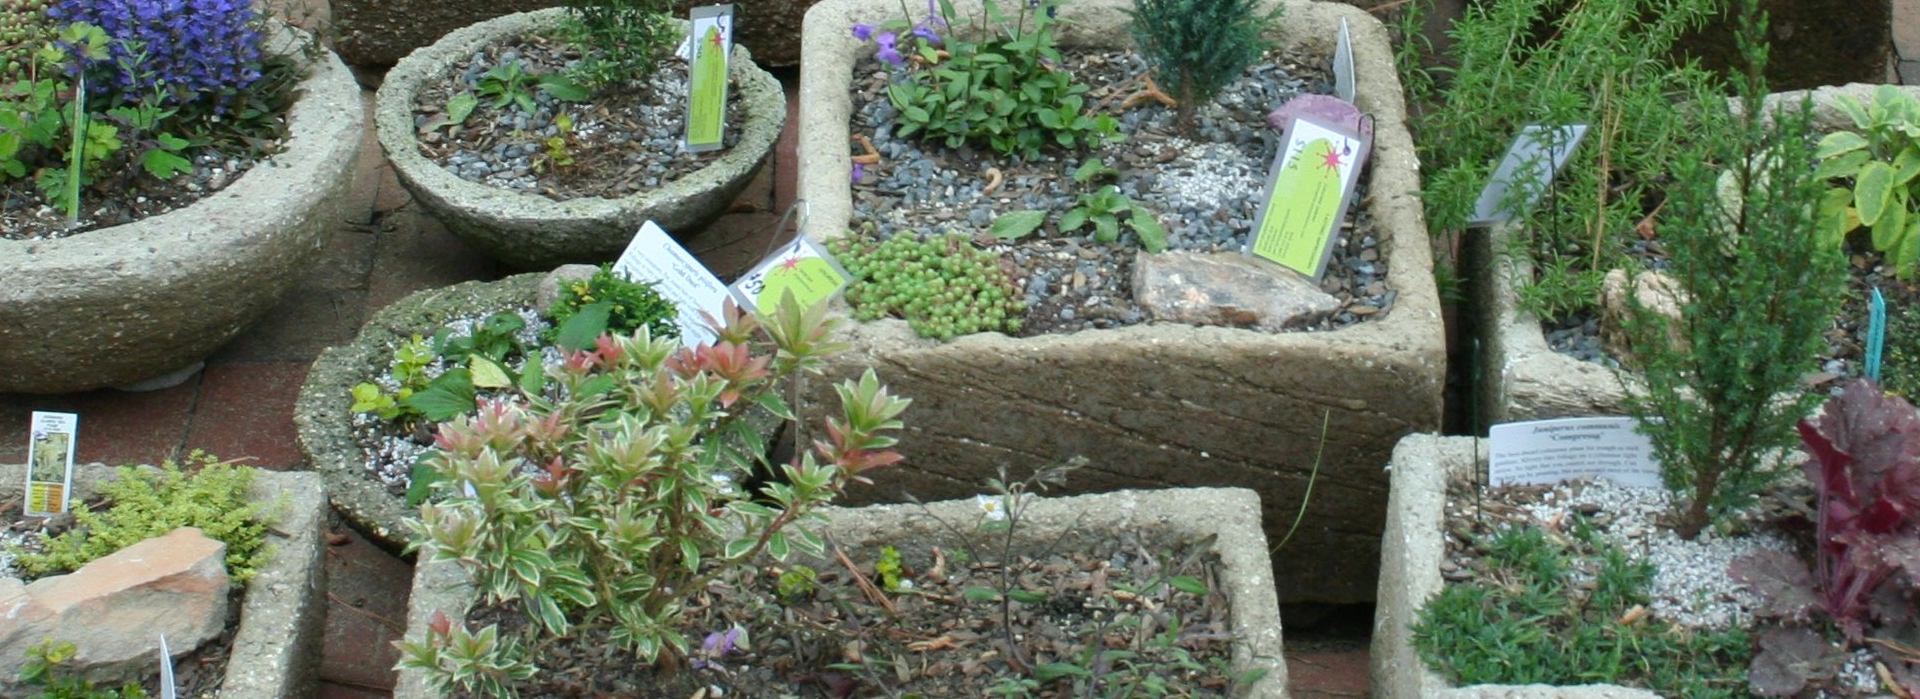 DIY kvetináč z hypertufy